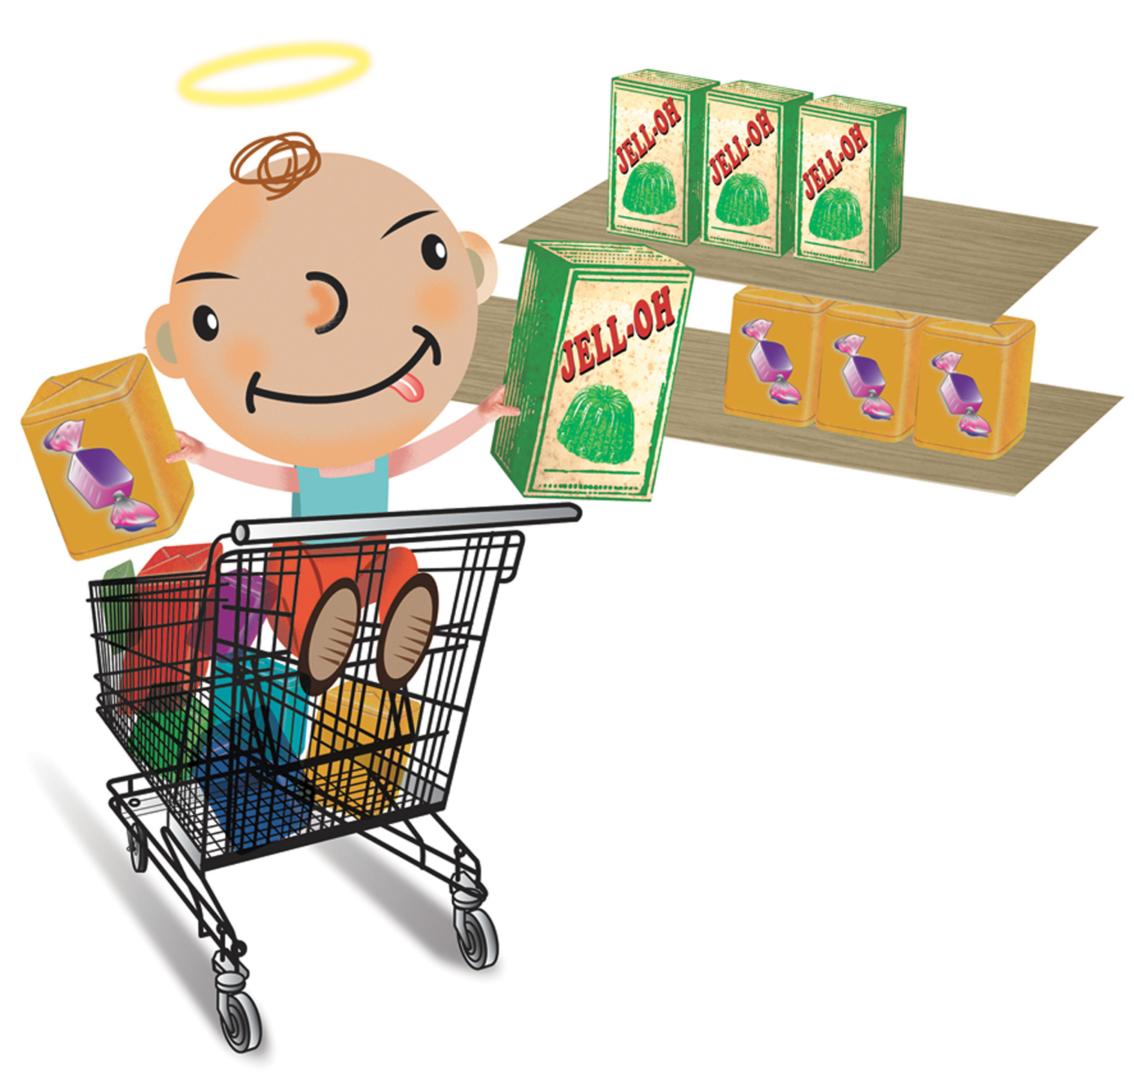 kid-taking-stuff-supermarket-1440